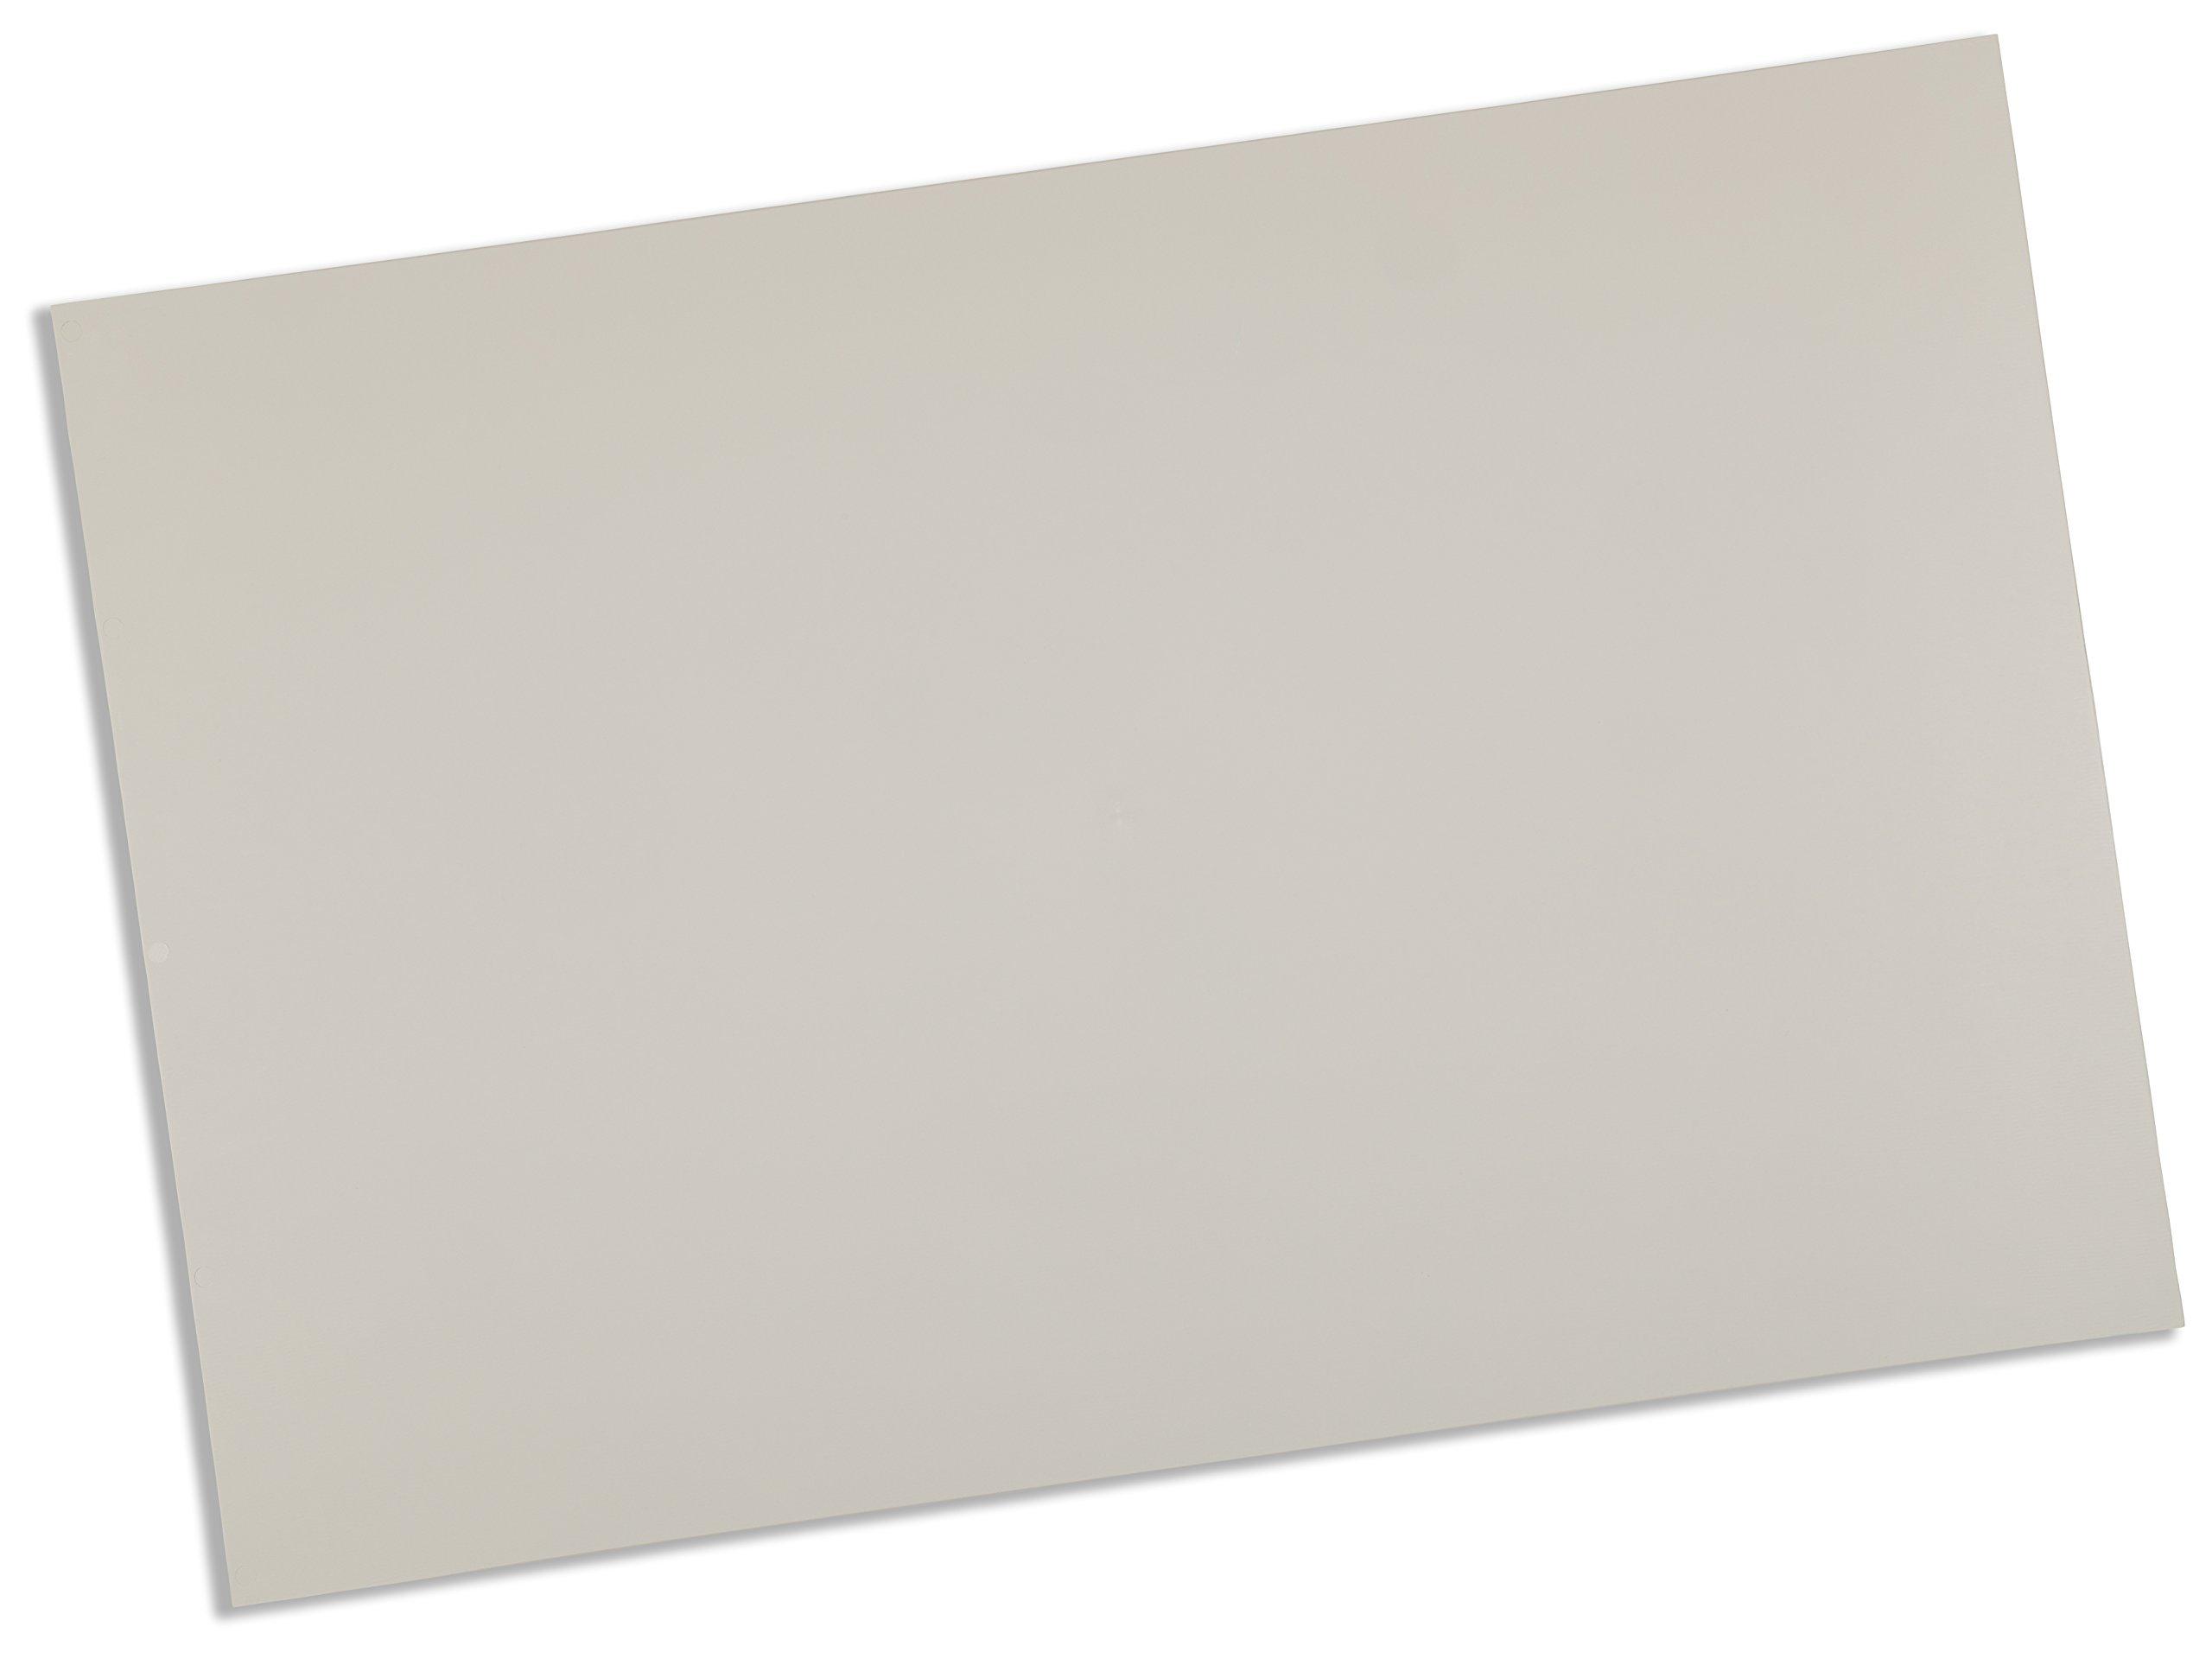 Rolyan Splinting Material Sheet, Polyform, White, 1/8'' x 24'' x 36'', Solid, Single Sheet